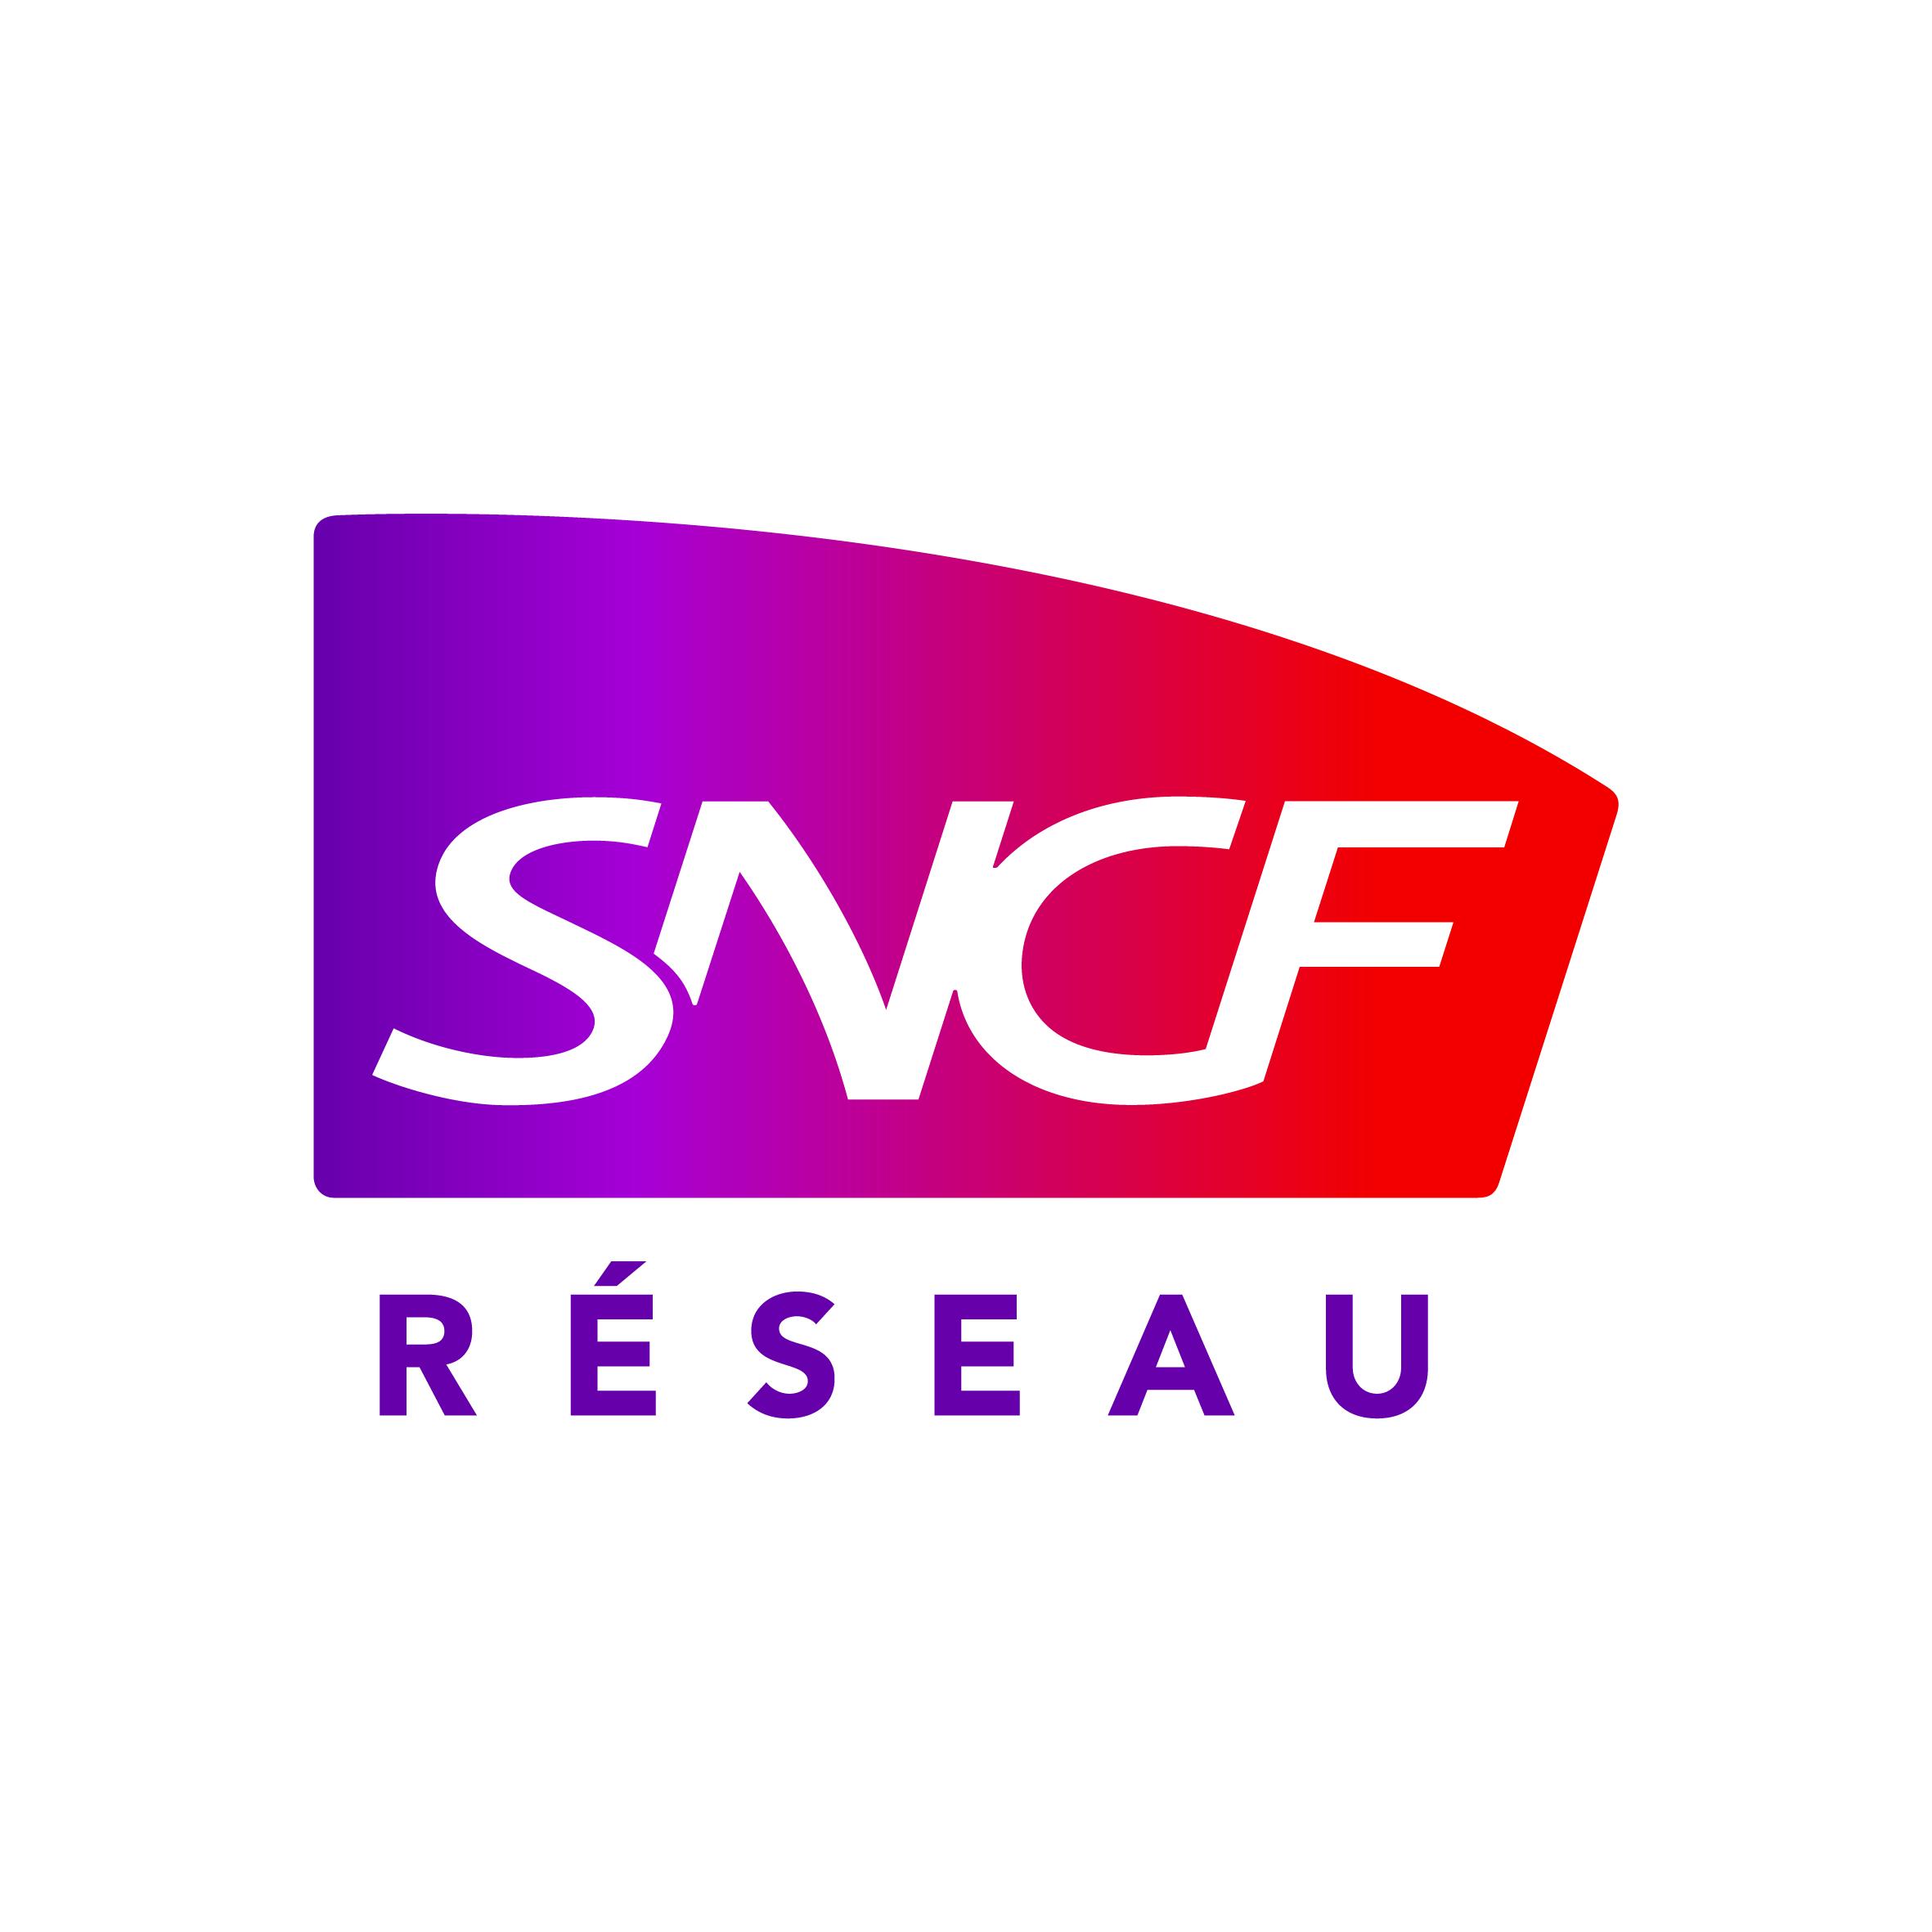 LOGO_SNCF_RESEAU_CMJN-01 (2)